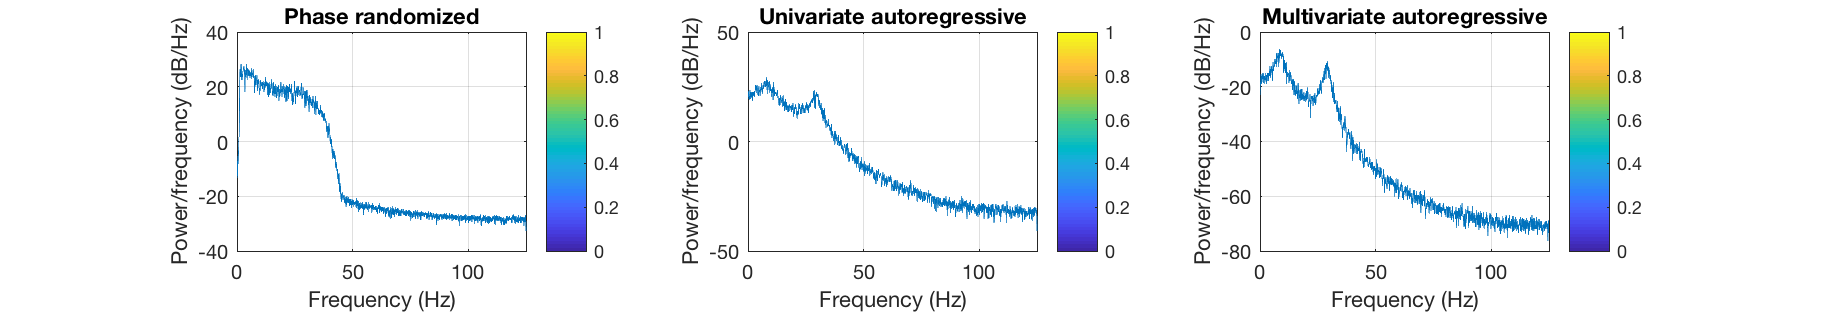 Utilities - Surrogate data